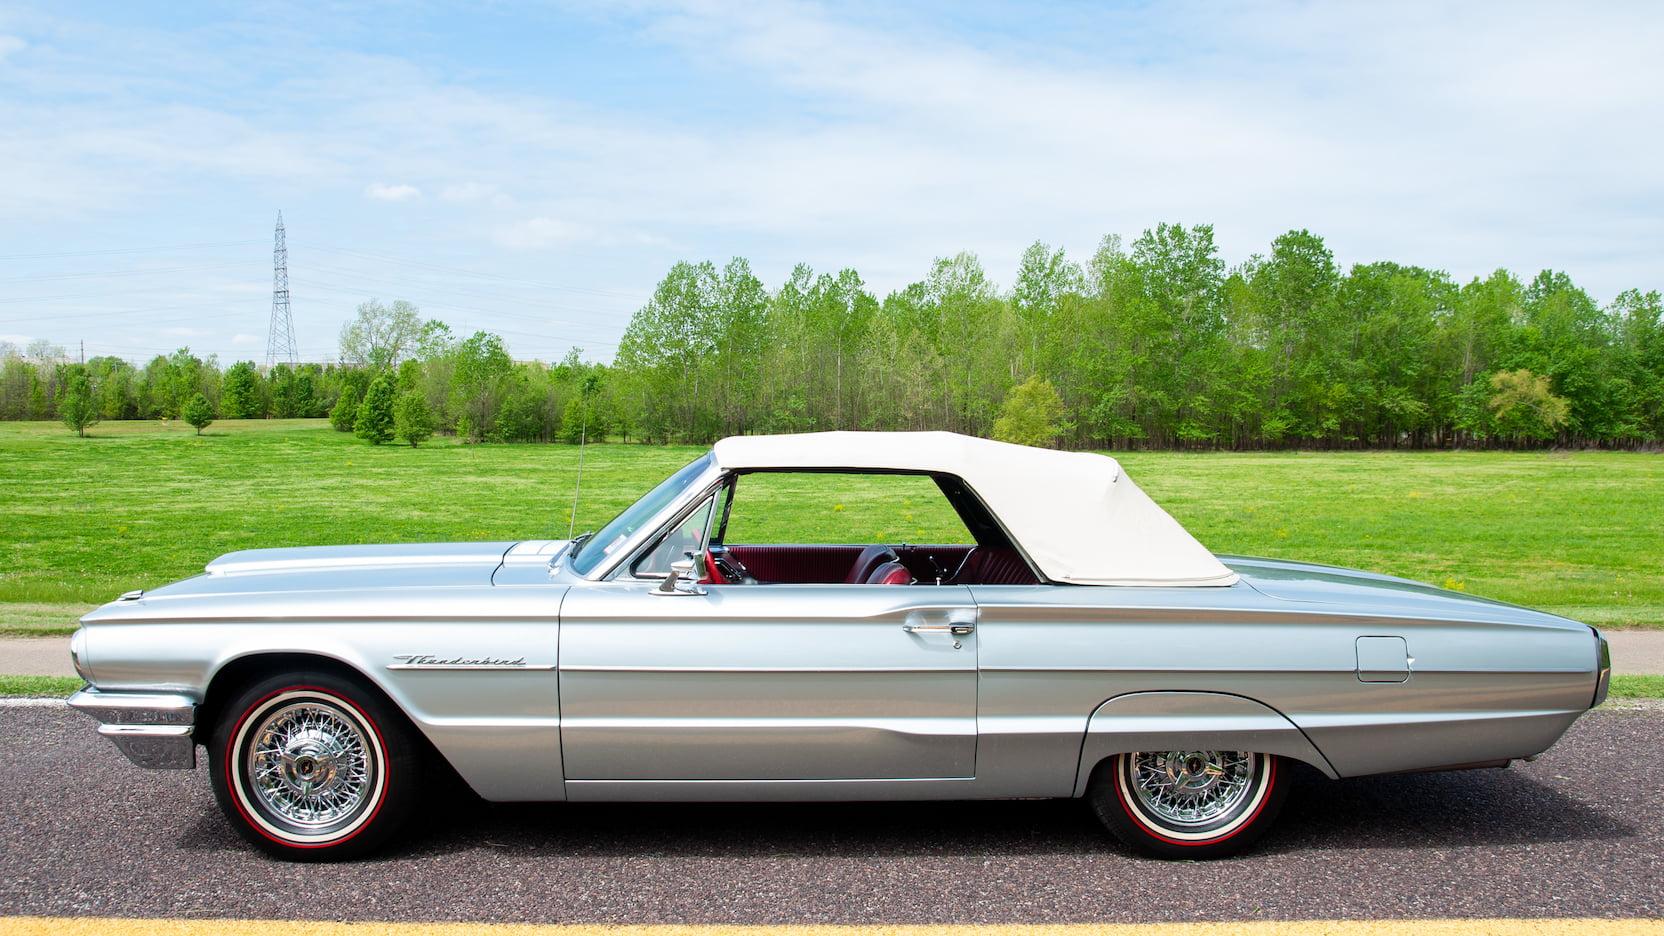 1964 Ford Thunderbird convertible top up